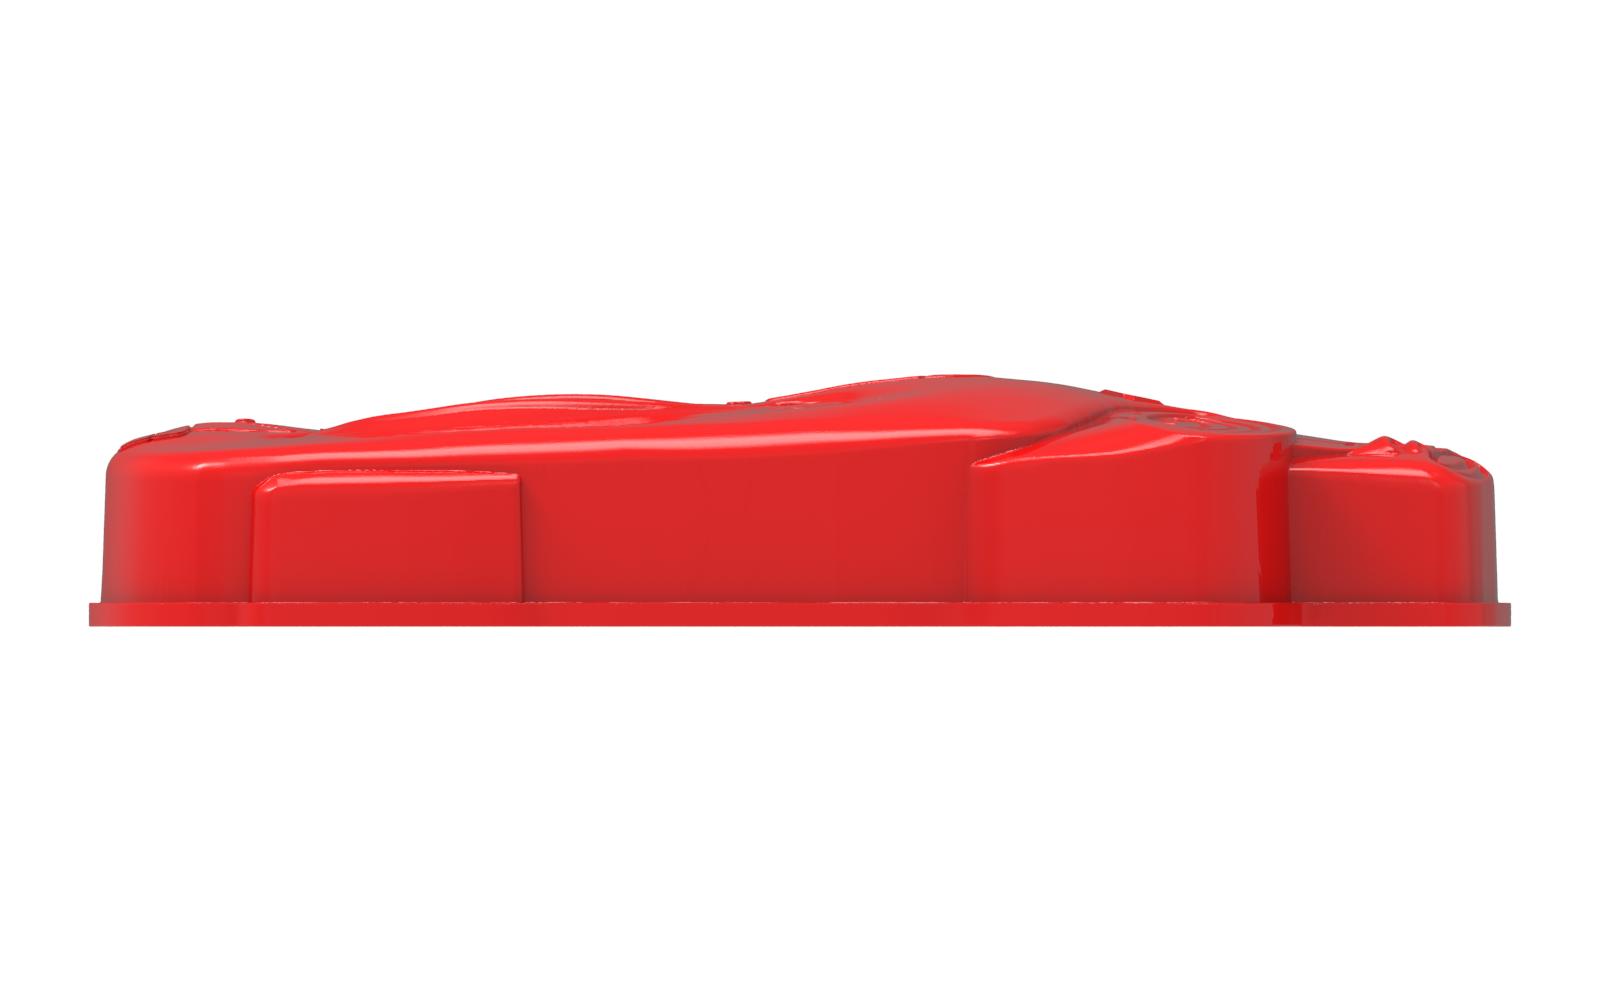 untitled.1669.png Download free STL file Pixar Cars - Mcqueen • 3D printable design, hcchong